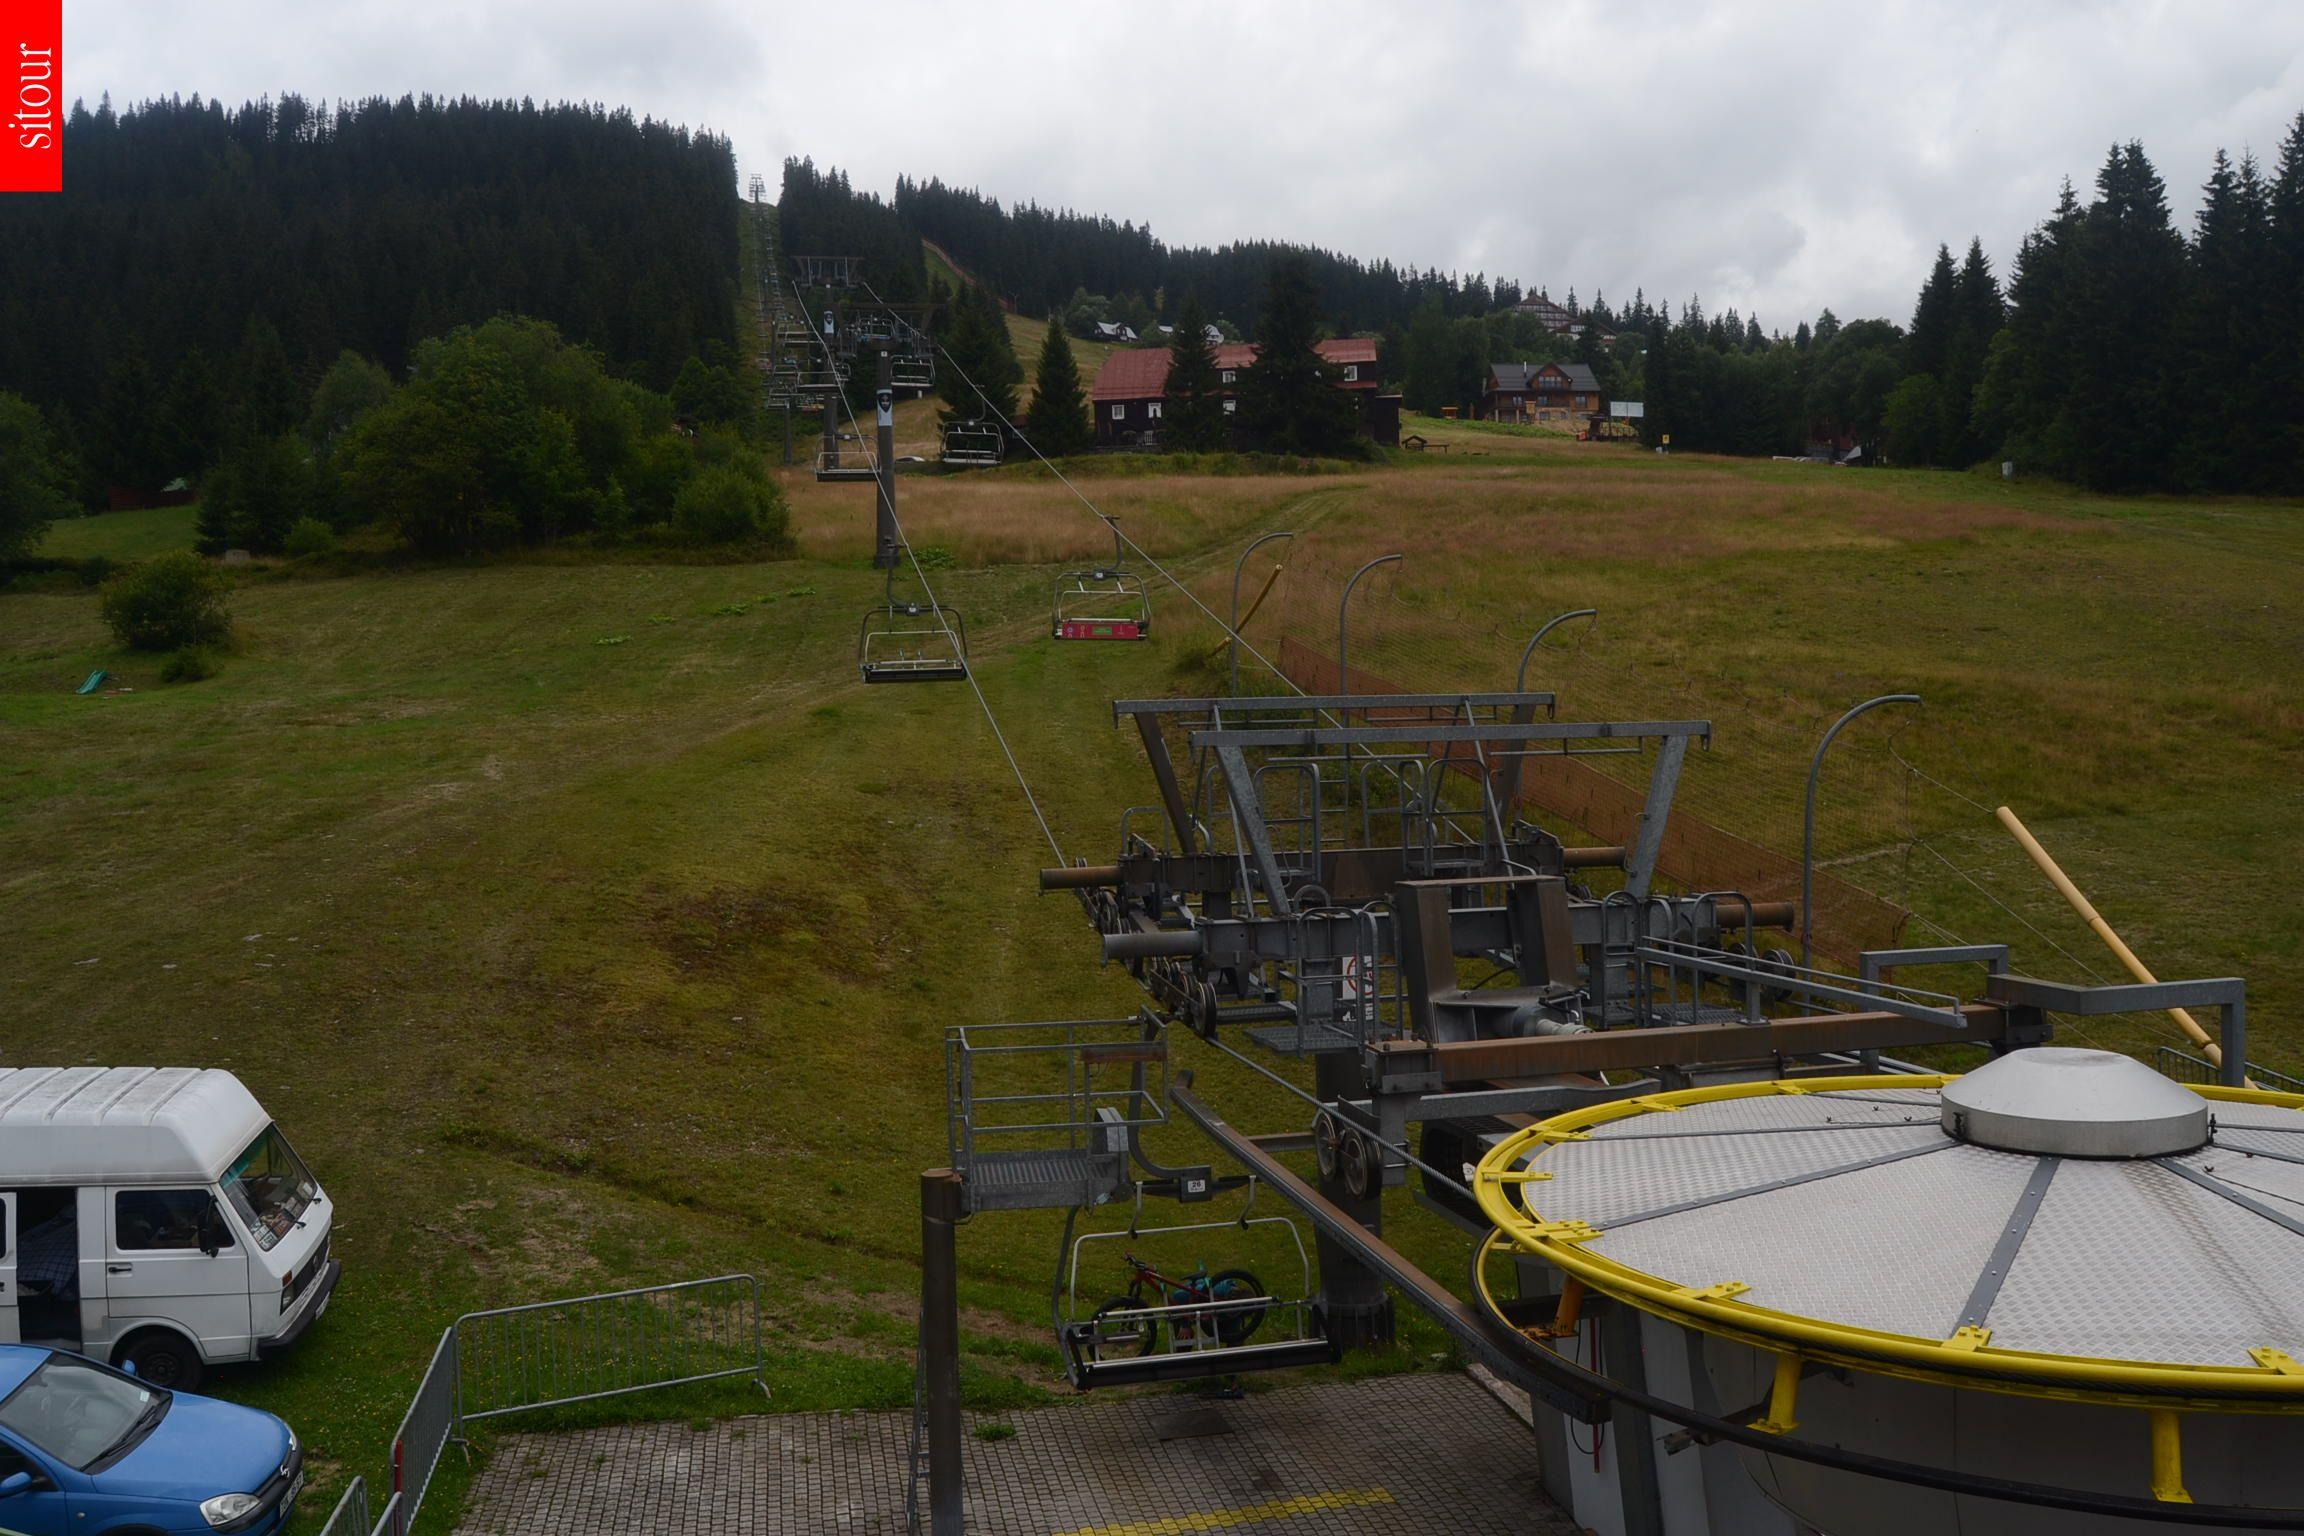 Webcam Ski Resort Pec pod Snezkou Hnedy Vrch - Giant Mountains